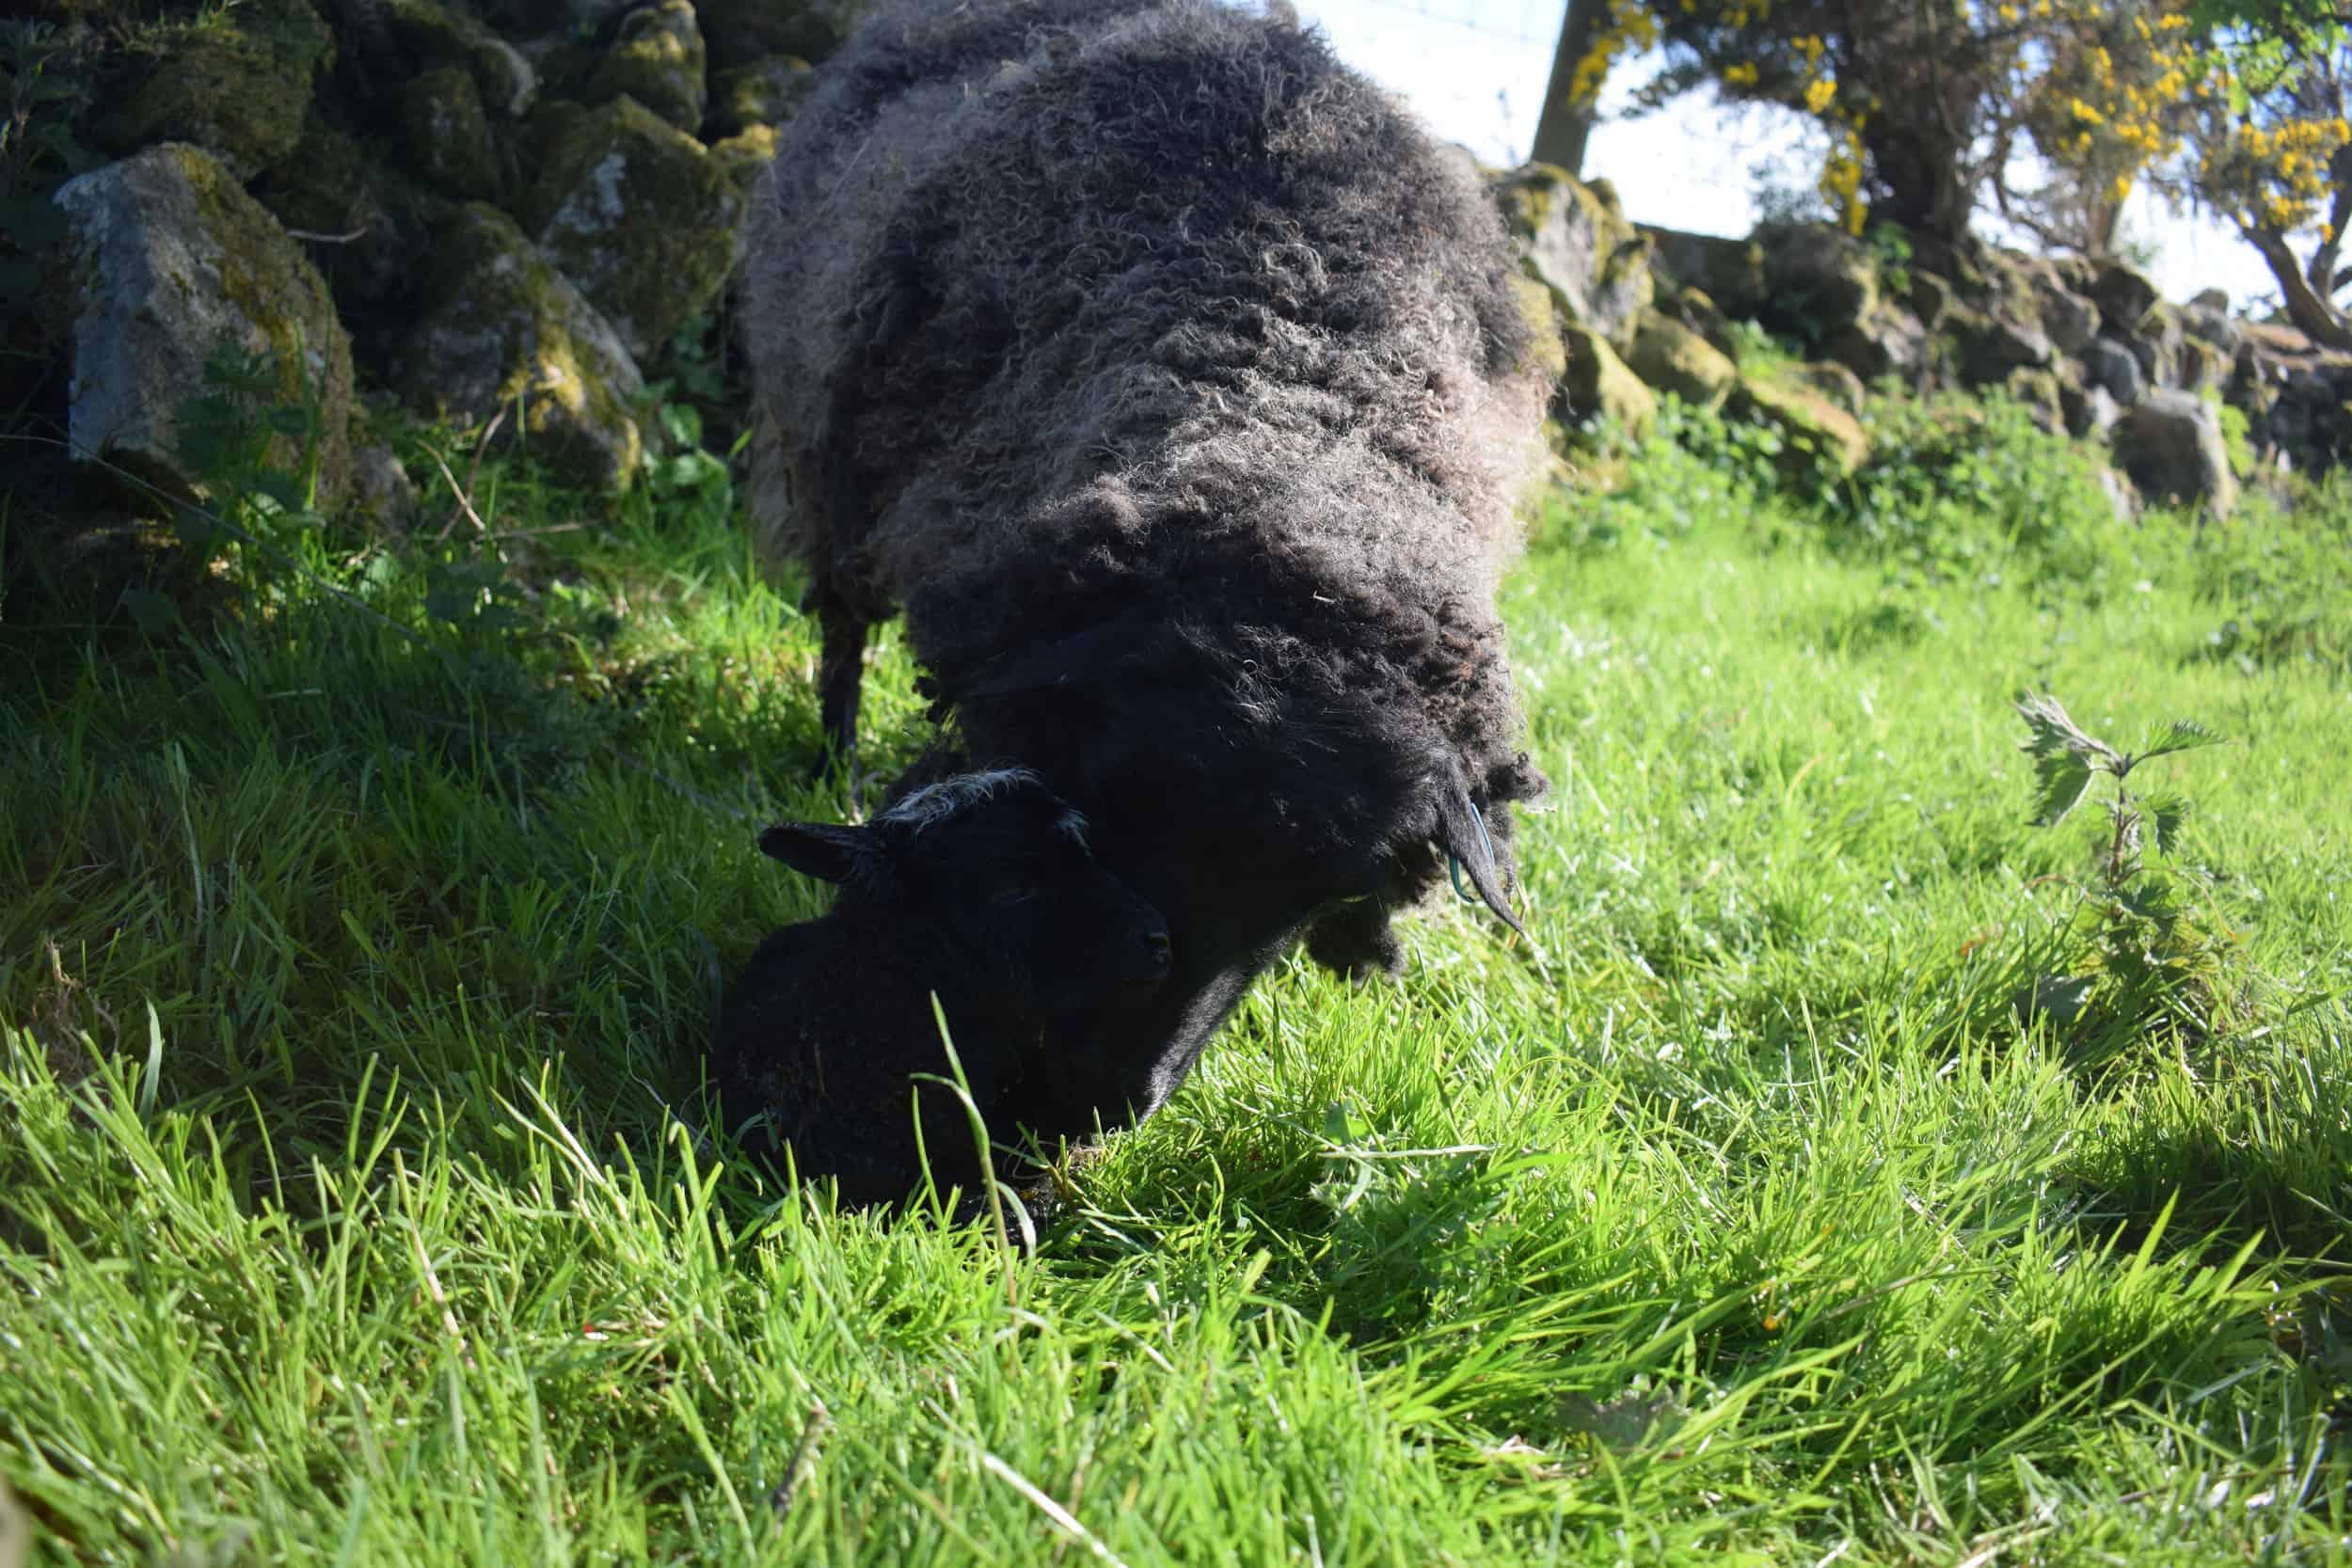 Currant black shetland sheep grandma kind fibre wool crafts raisin new mum again